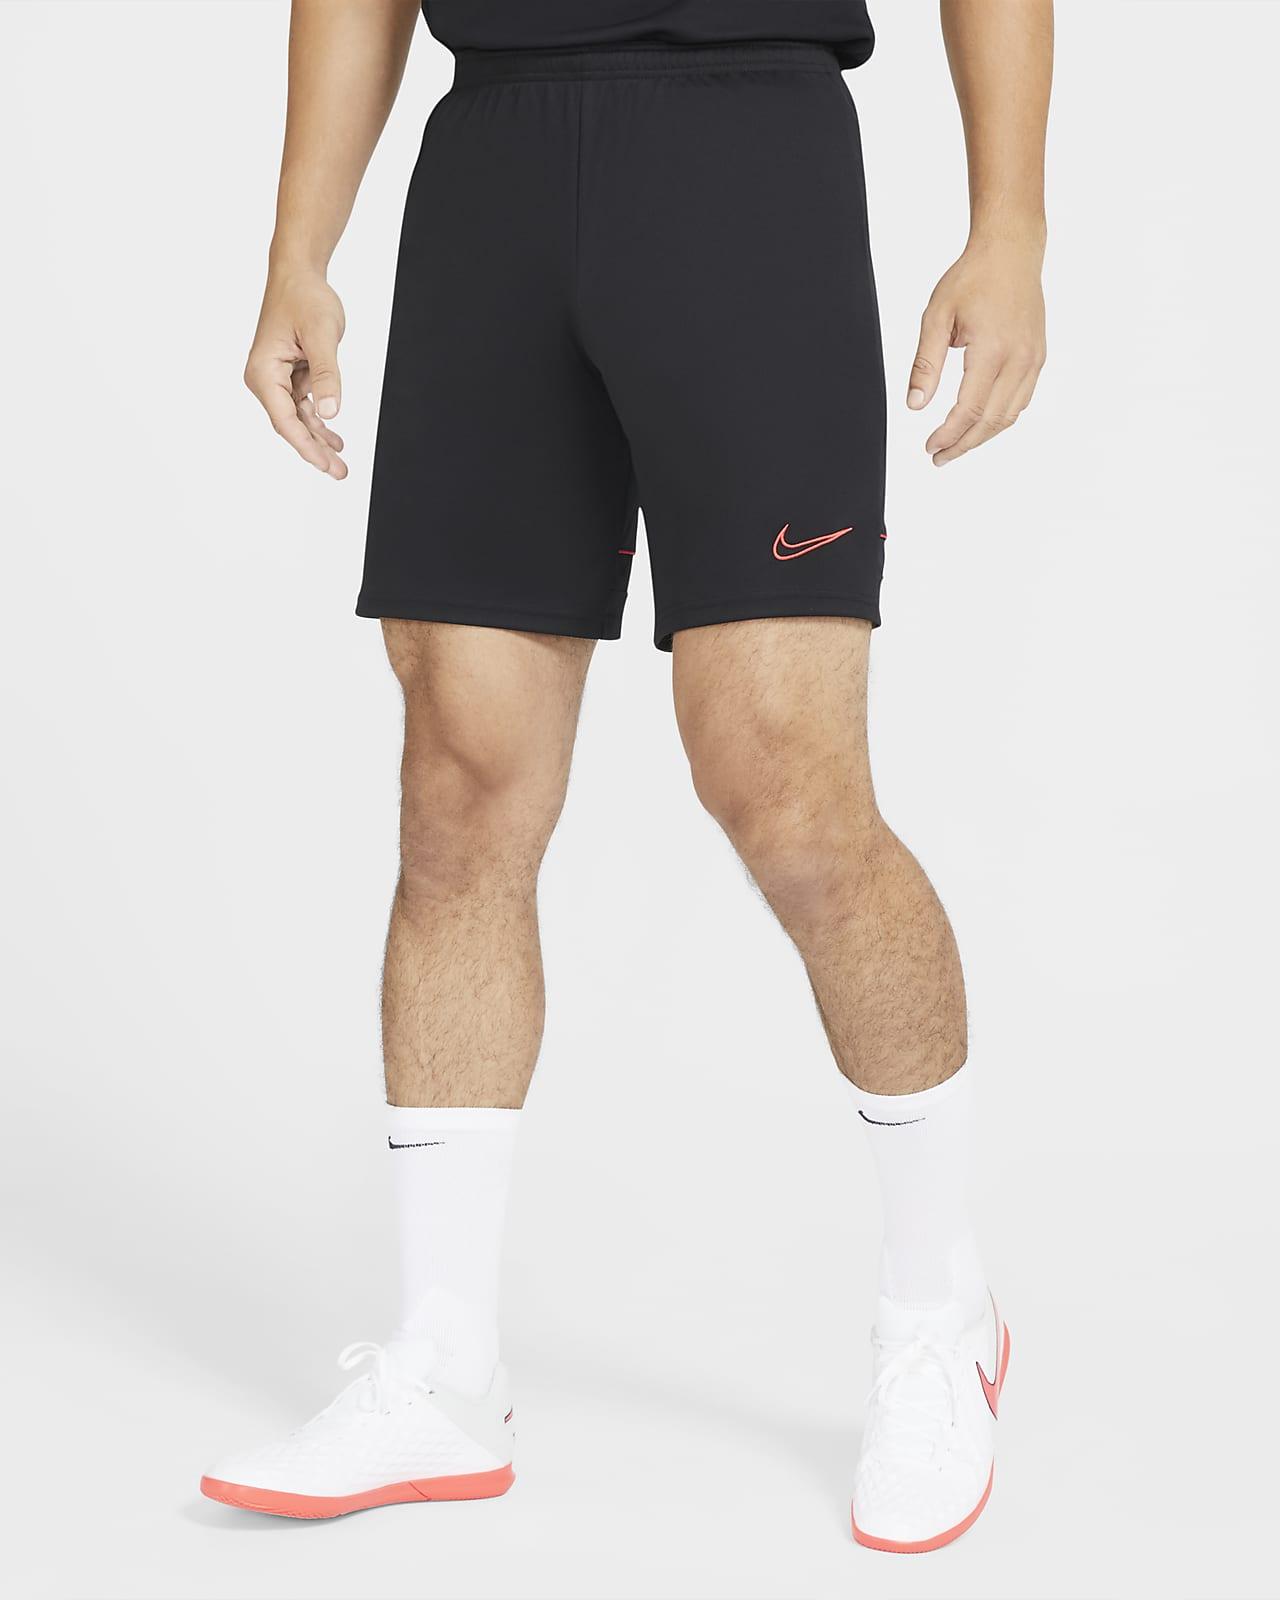 Nike Dri-FIT Academy Men's Knit Soccer Shorts